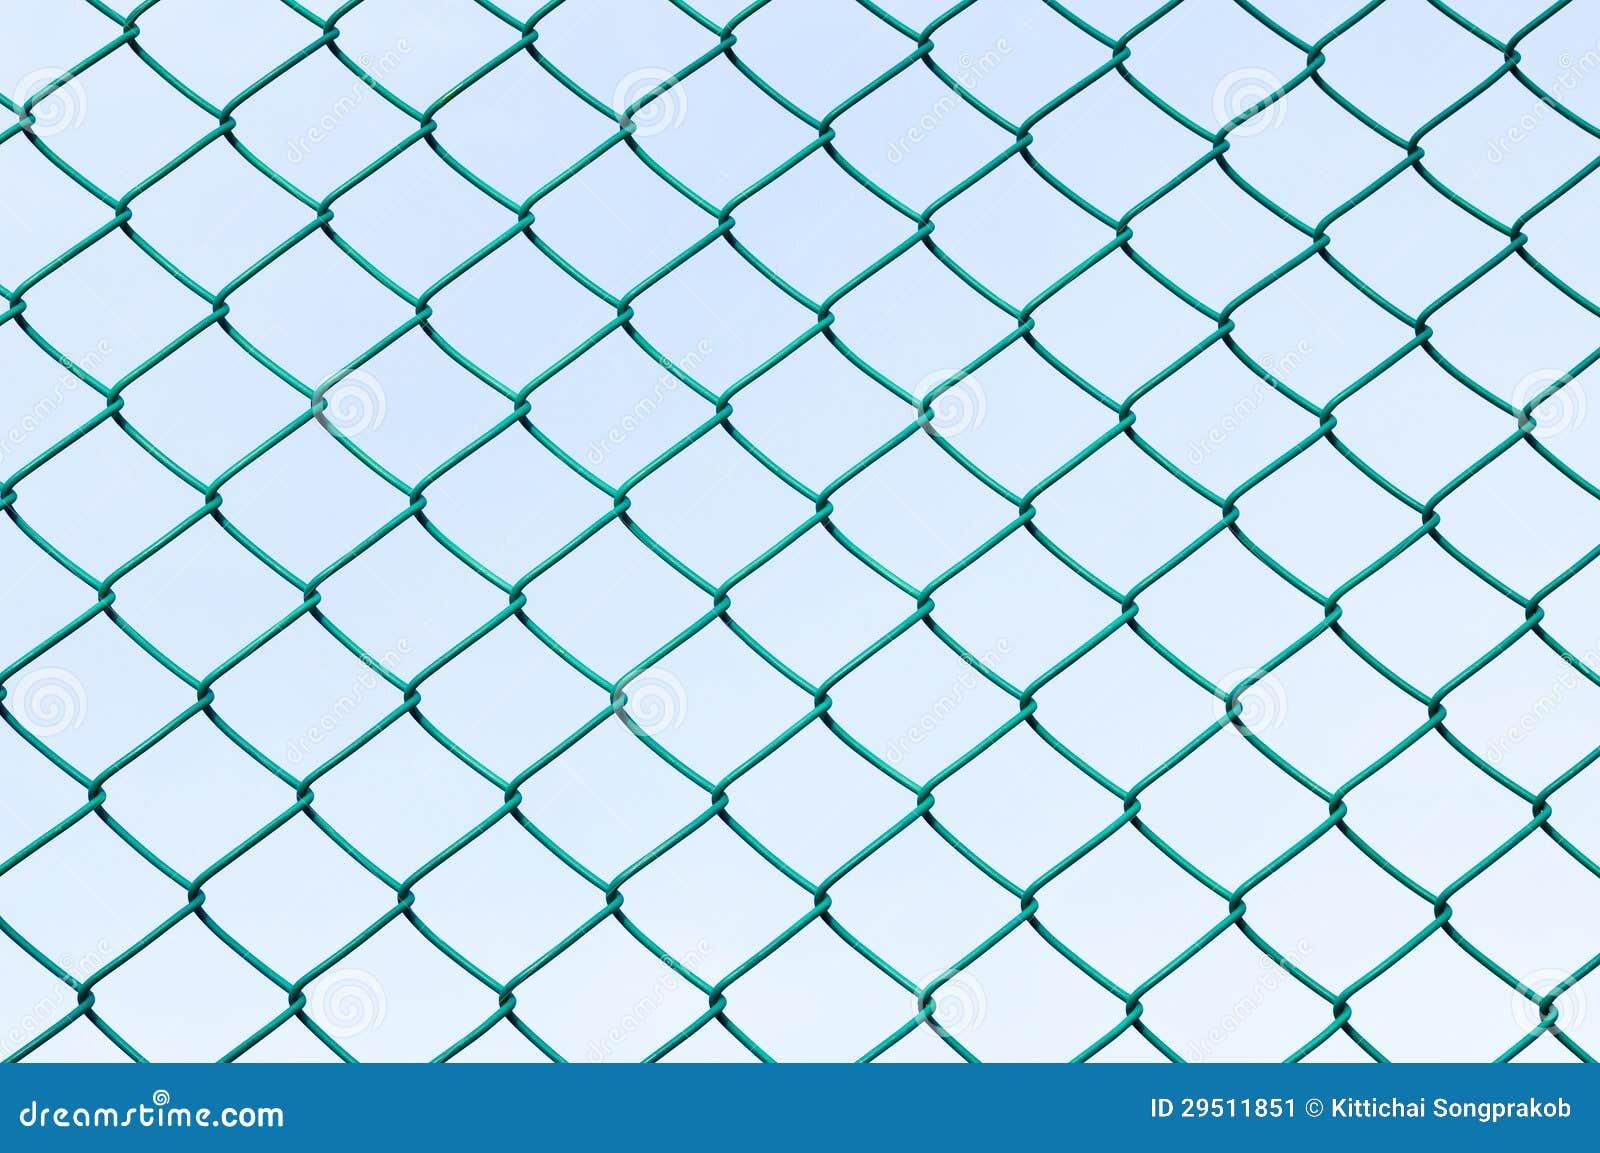 Groen draadnetwerk